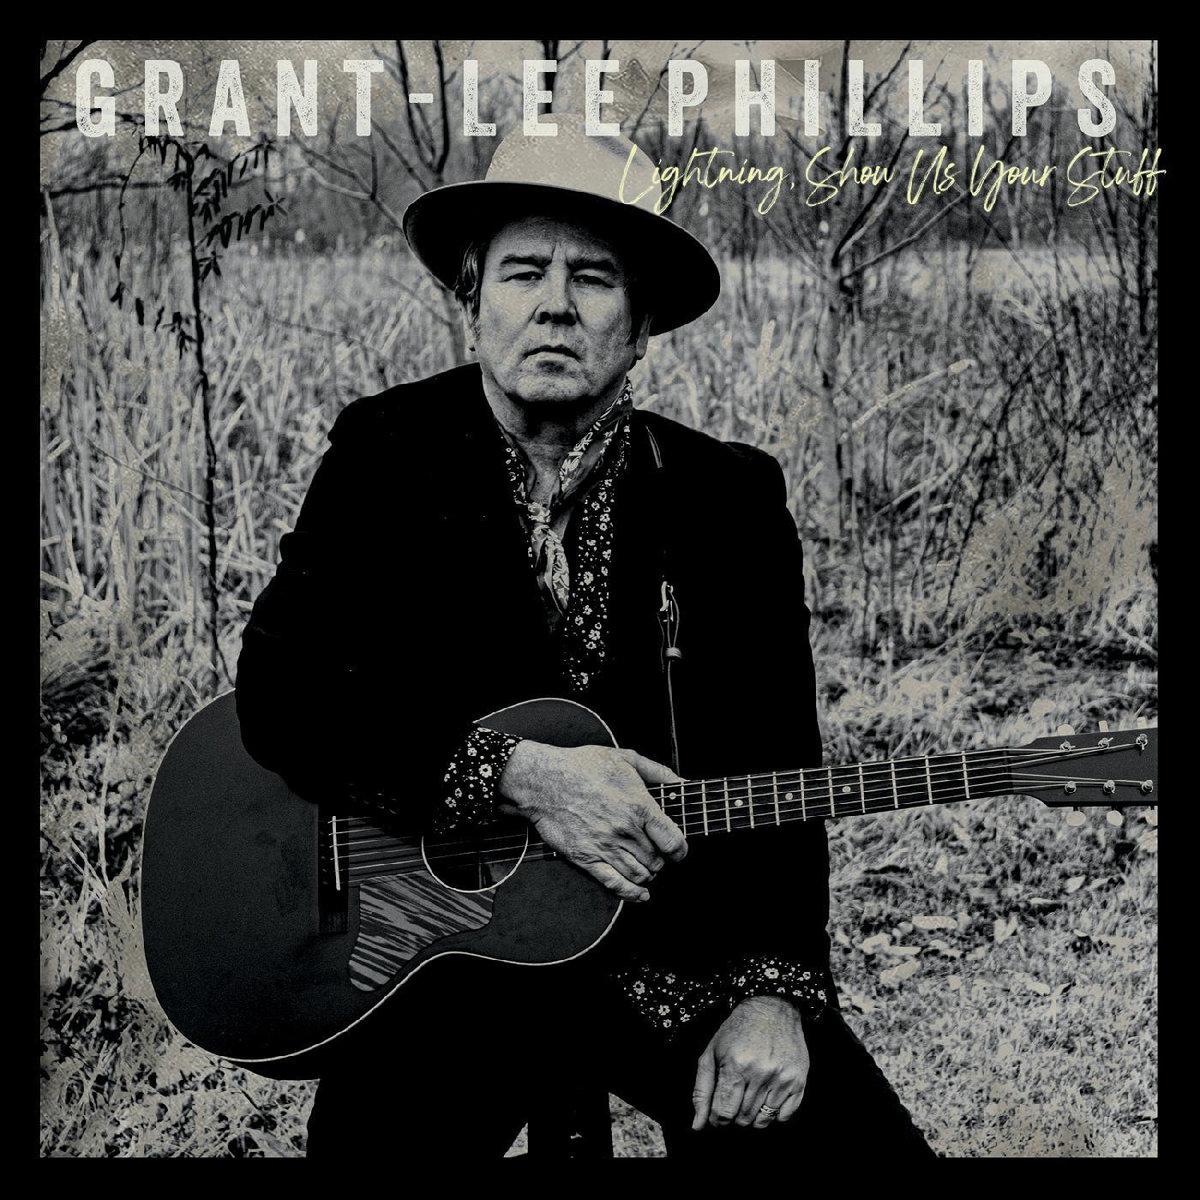 Grant-Lee Phillips Lightning Show Us Your Stuff